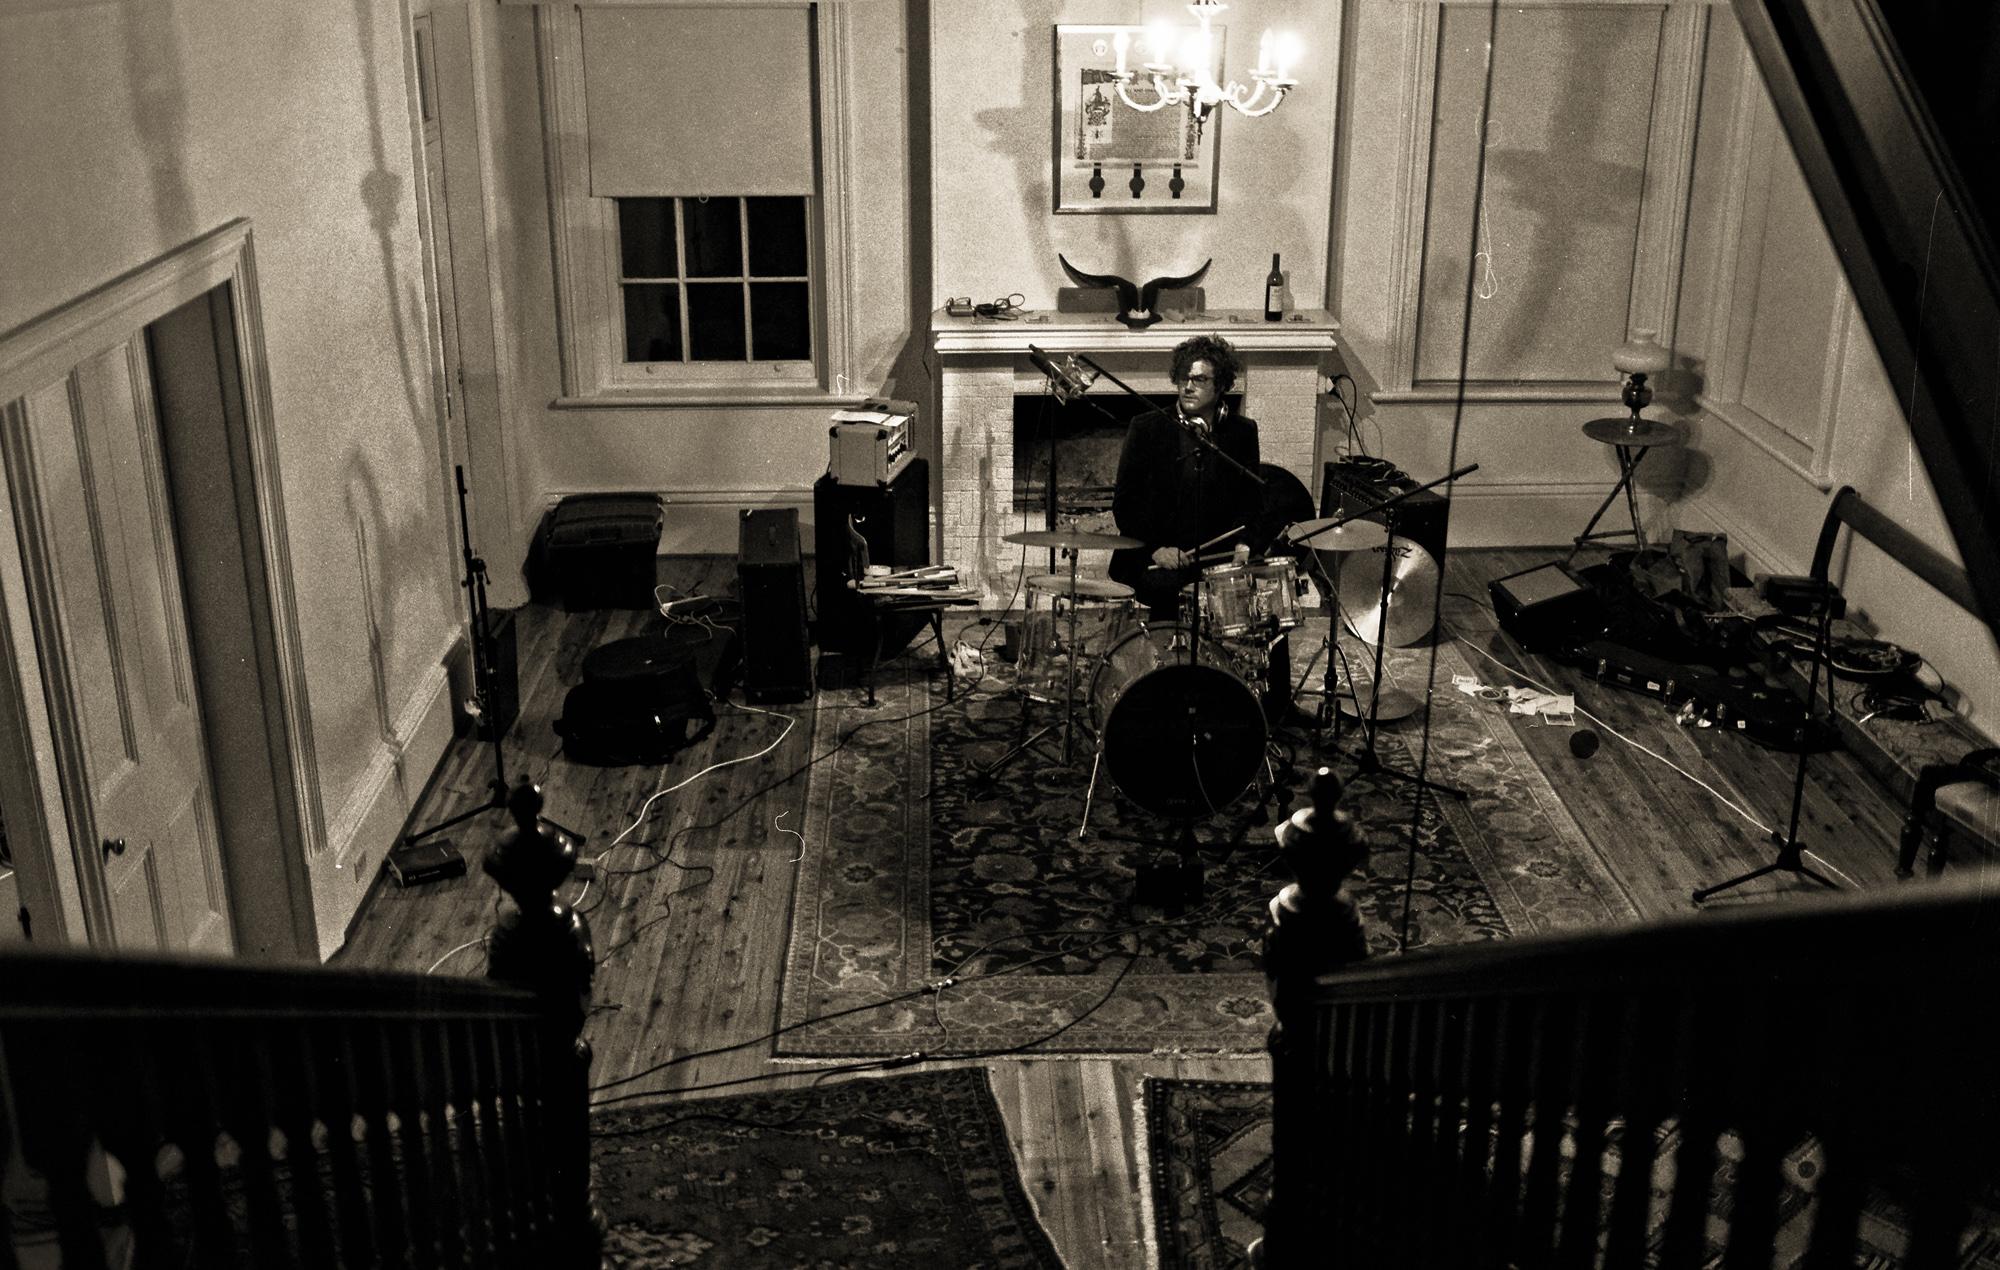 Jack Ladder and the Dreamlanders 10th anniversary of album Hurtsville